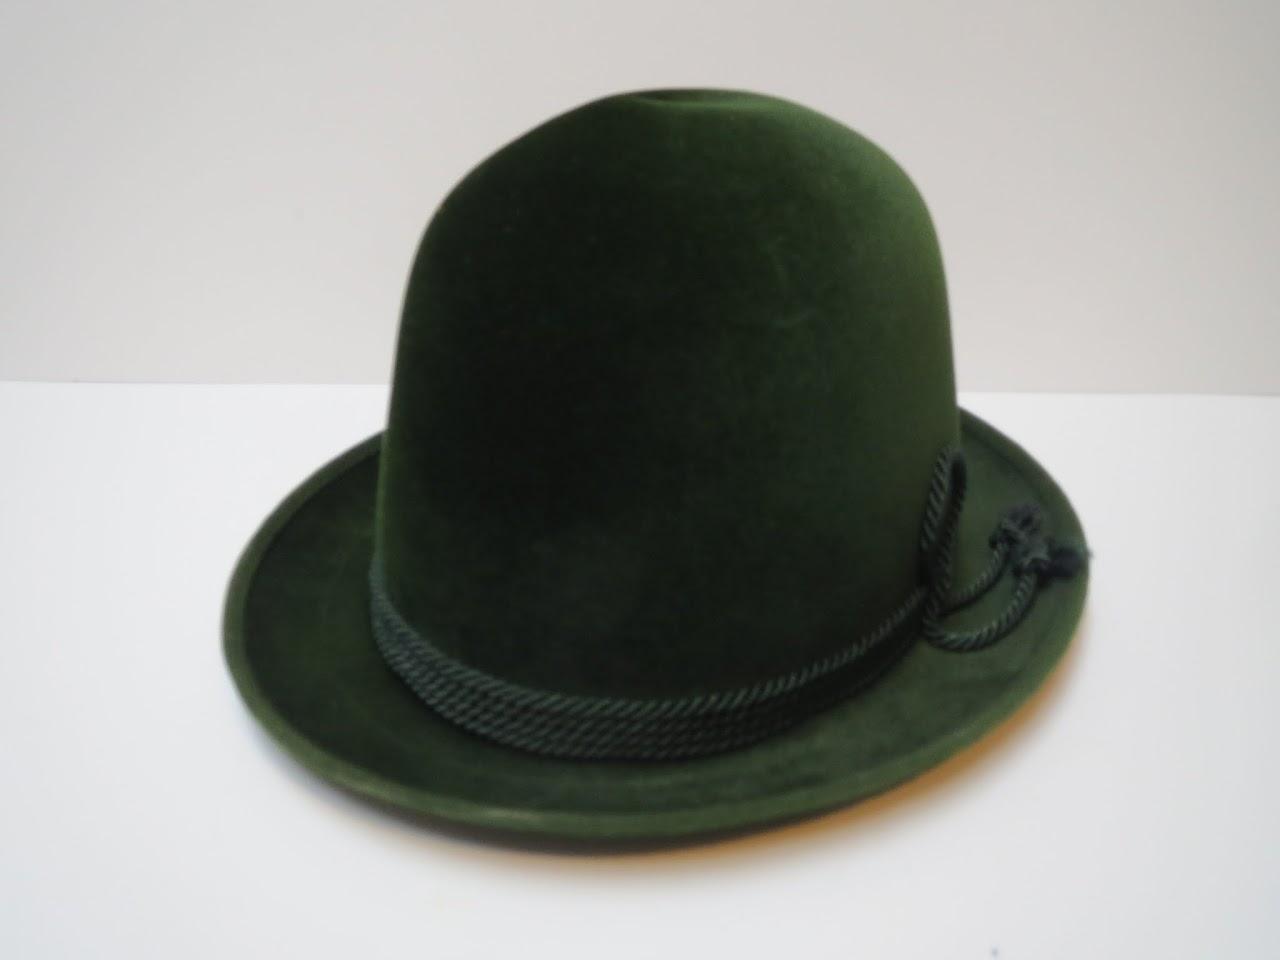 Vintage Cavanagh Green Felt Fedora